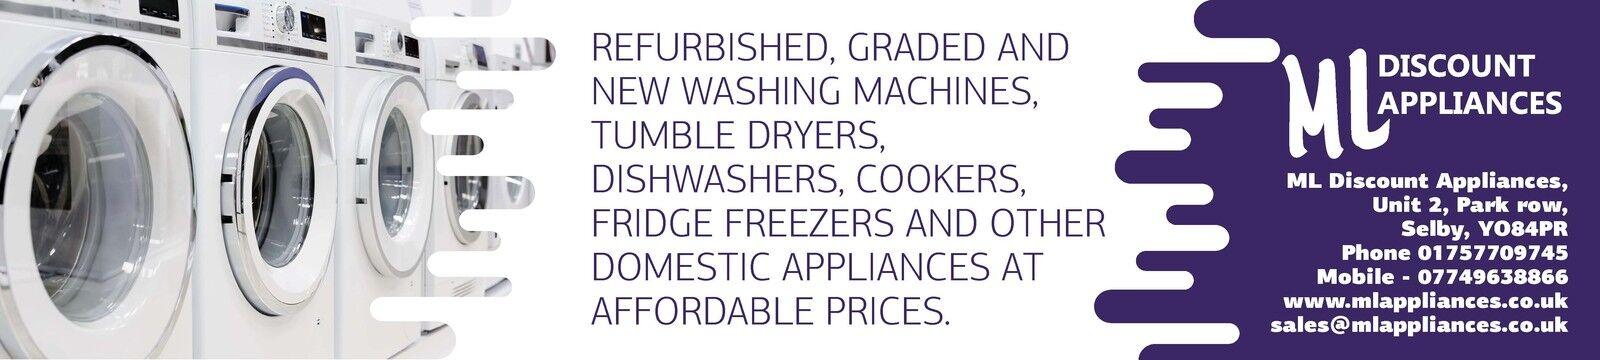 ML Discount Appliances